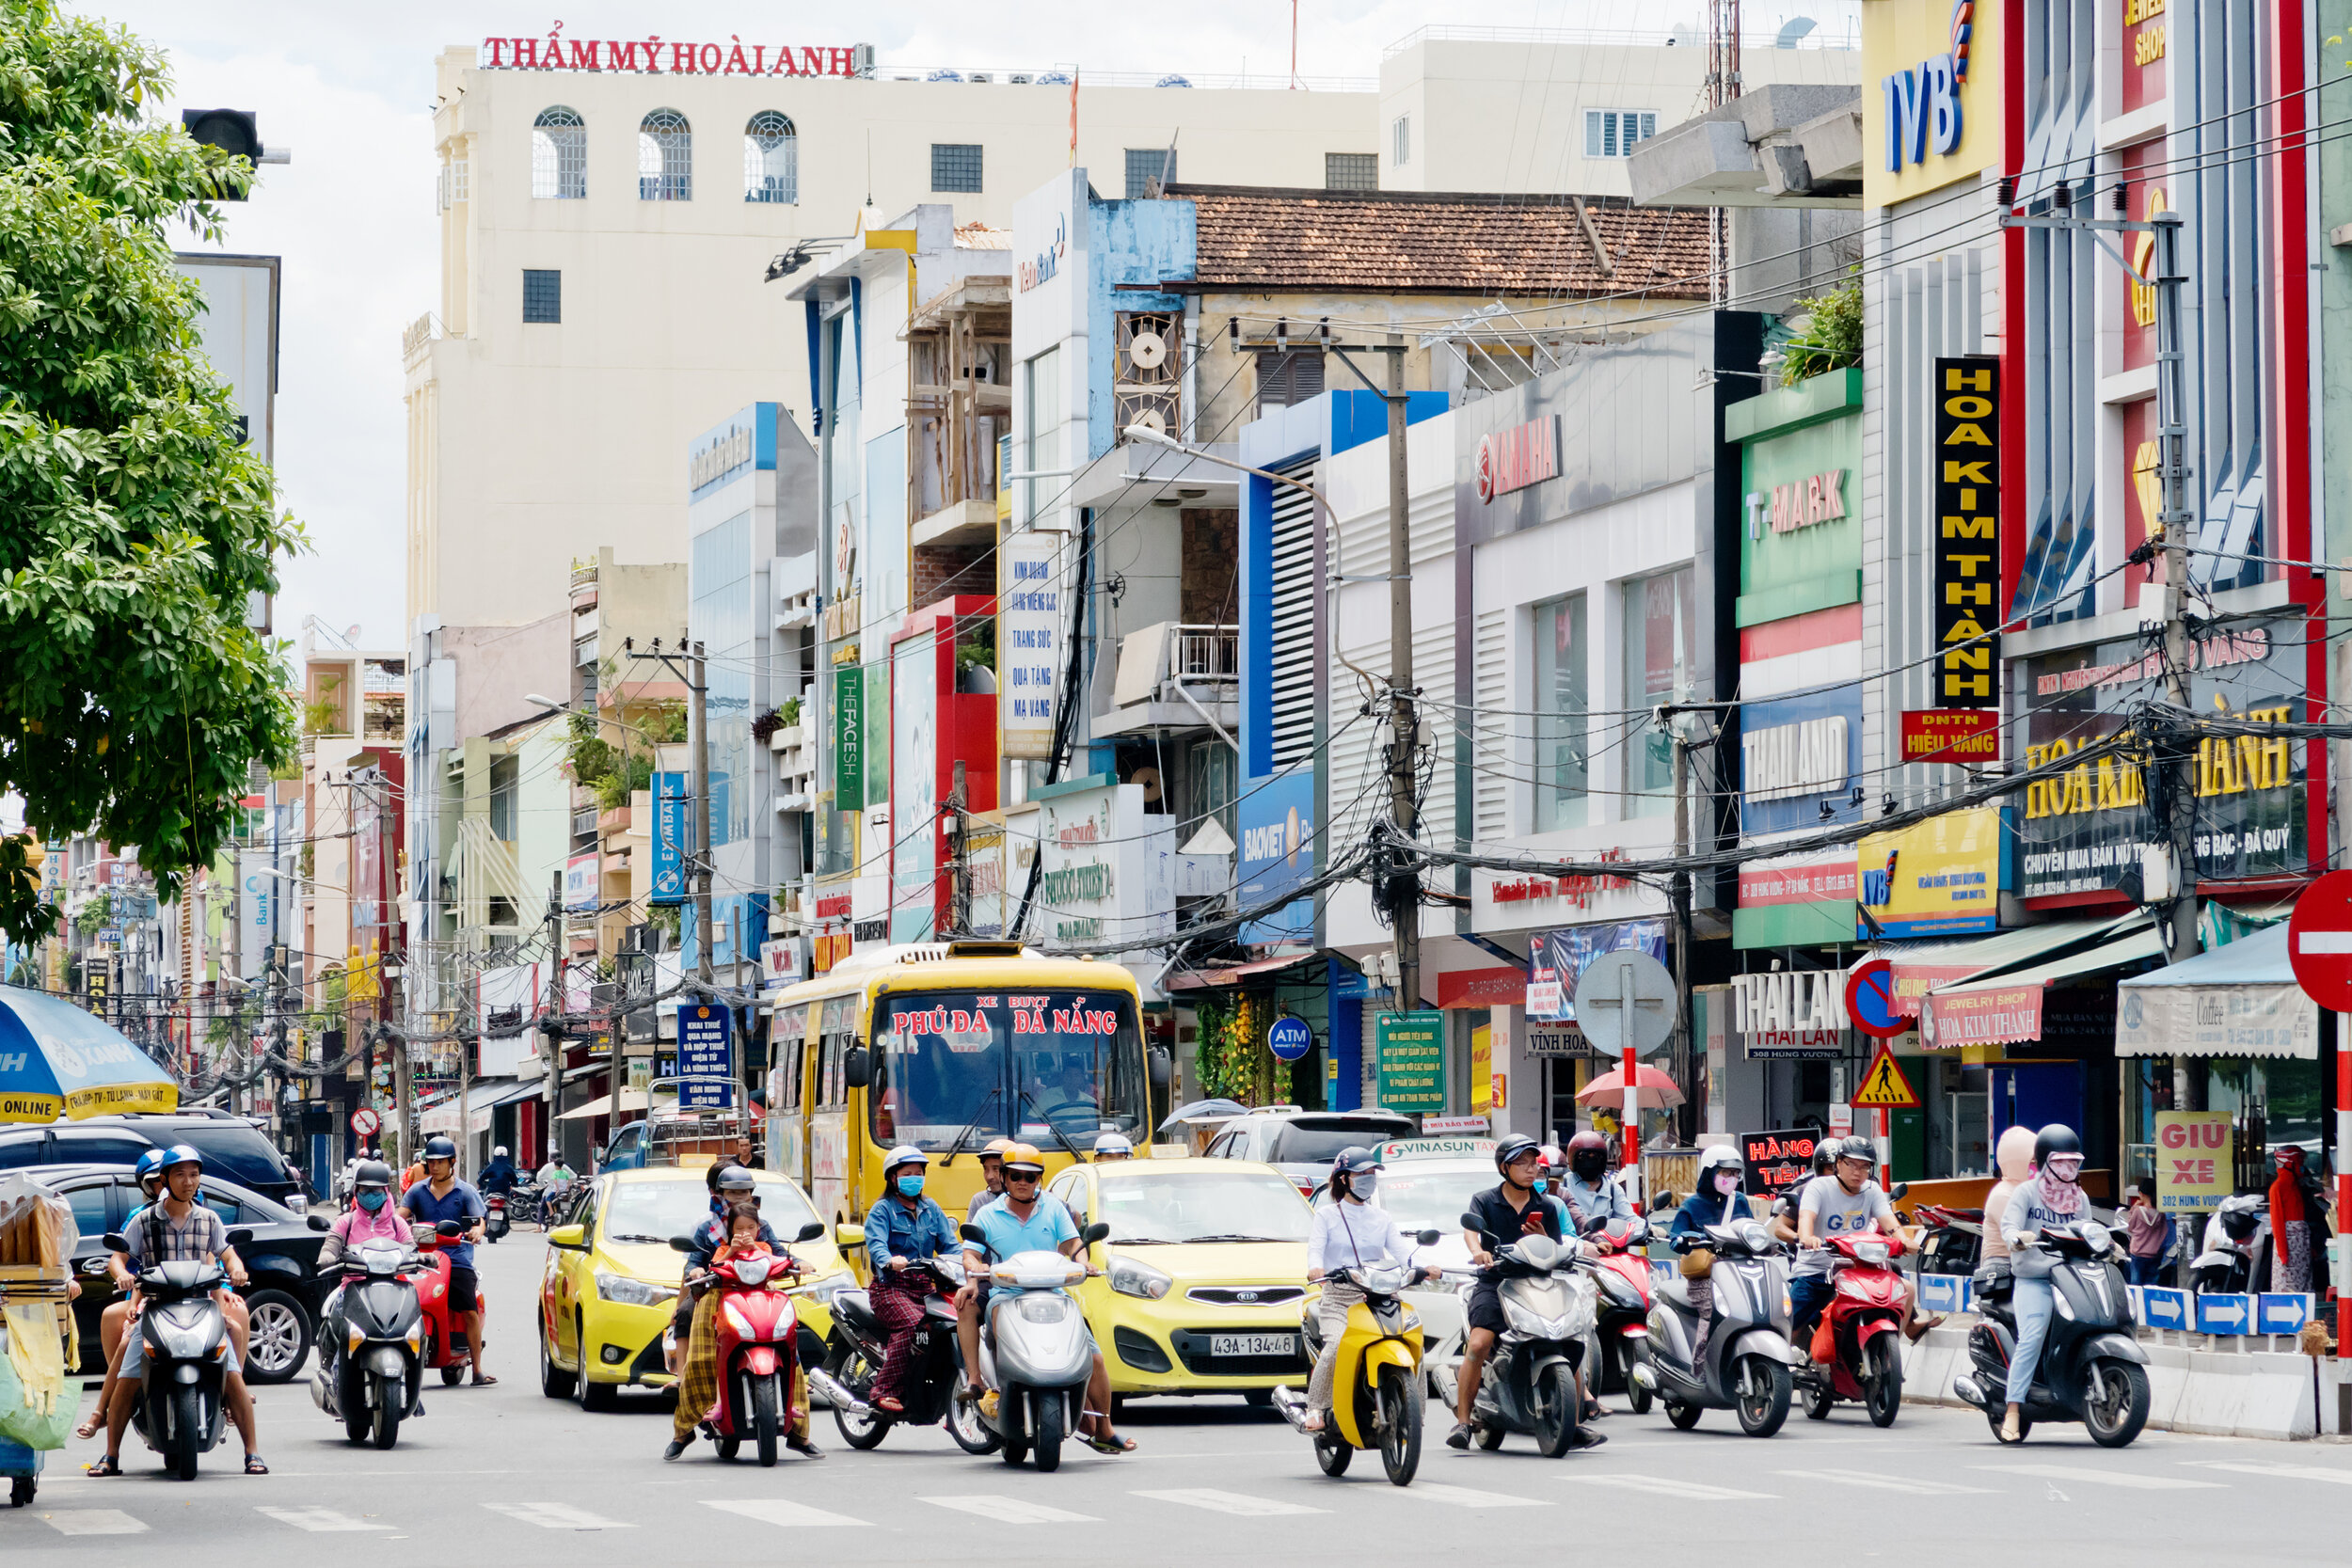 Da Nang street view - image from Shutterstock